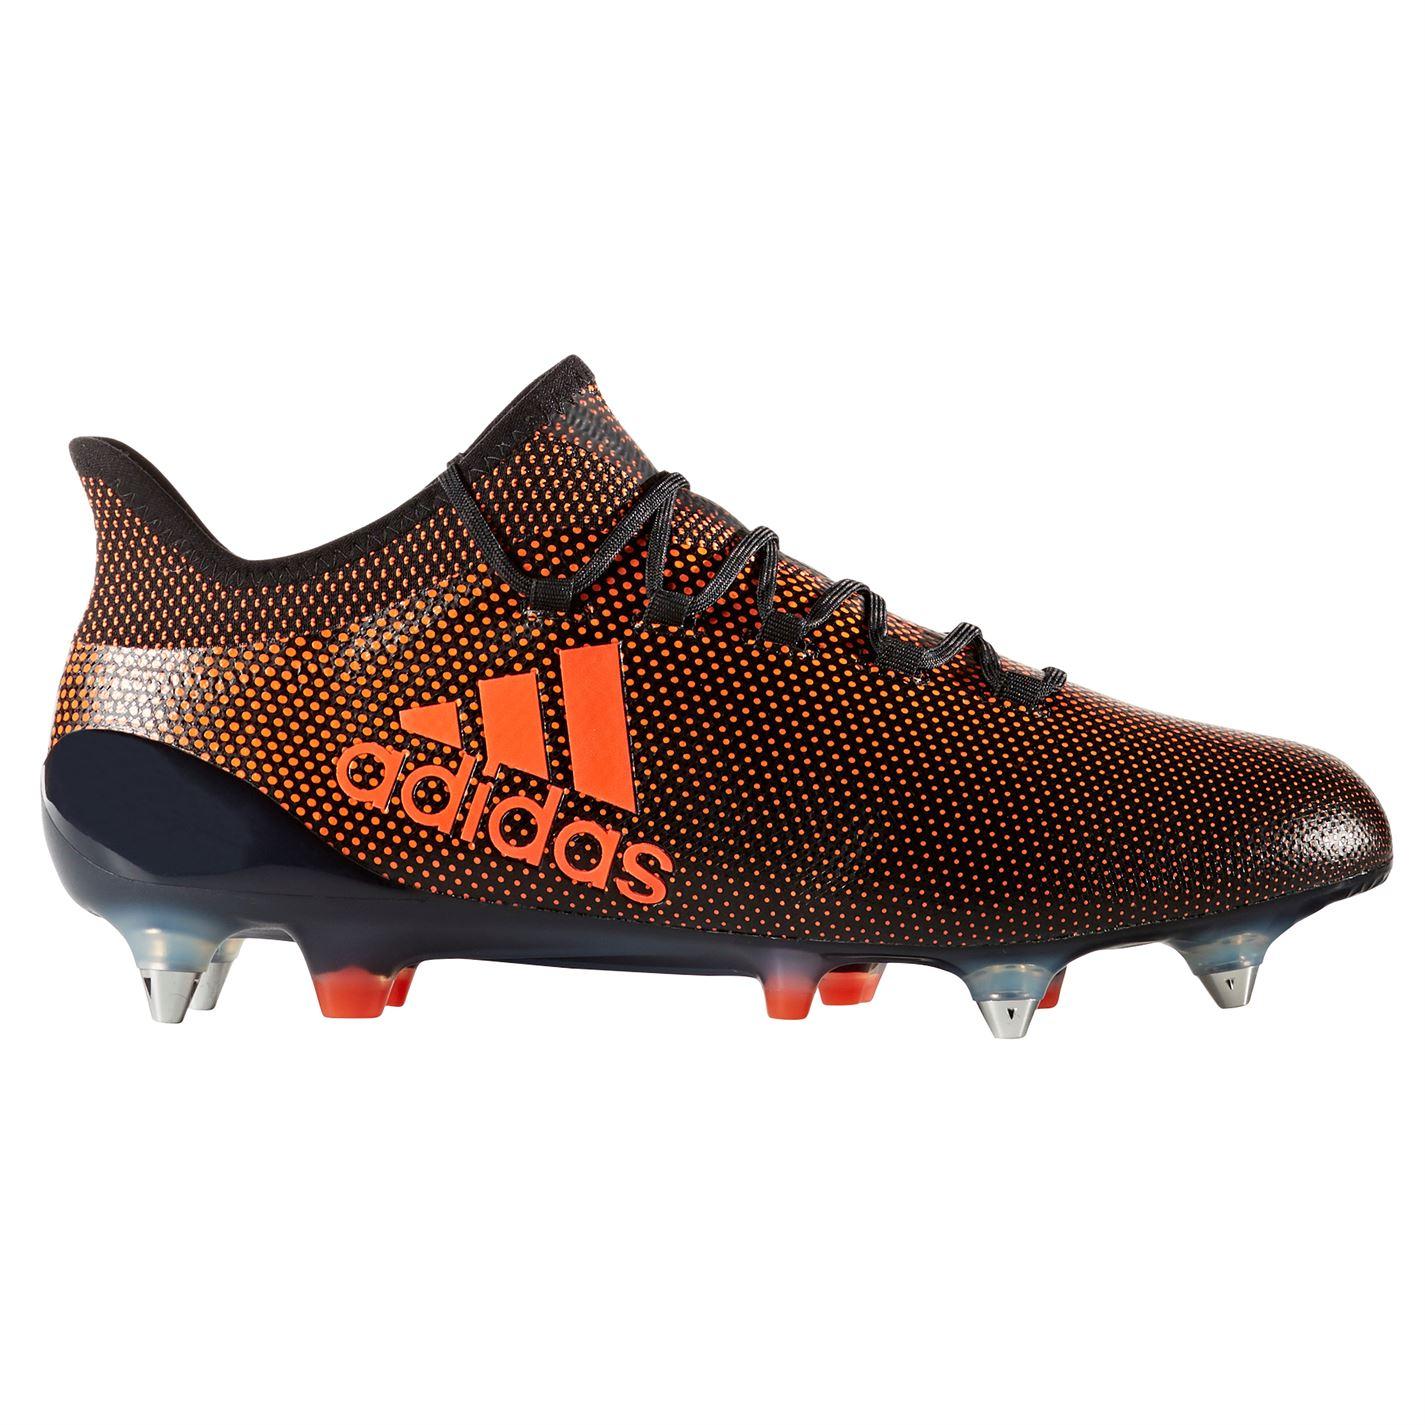 887f12022 Adidas x 17 1 sg football boots levně